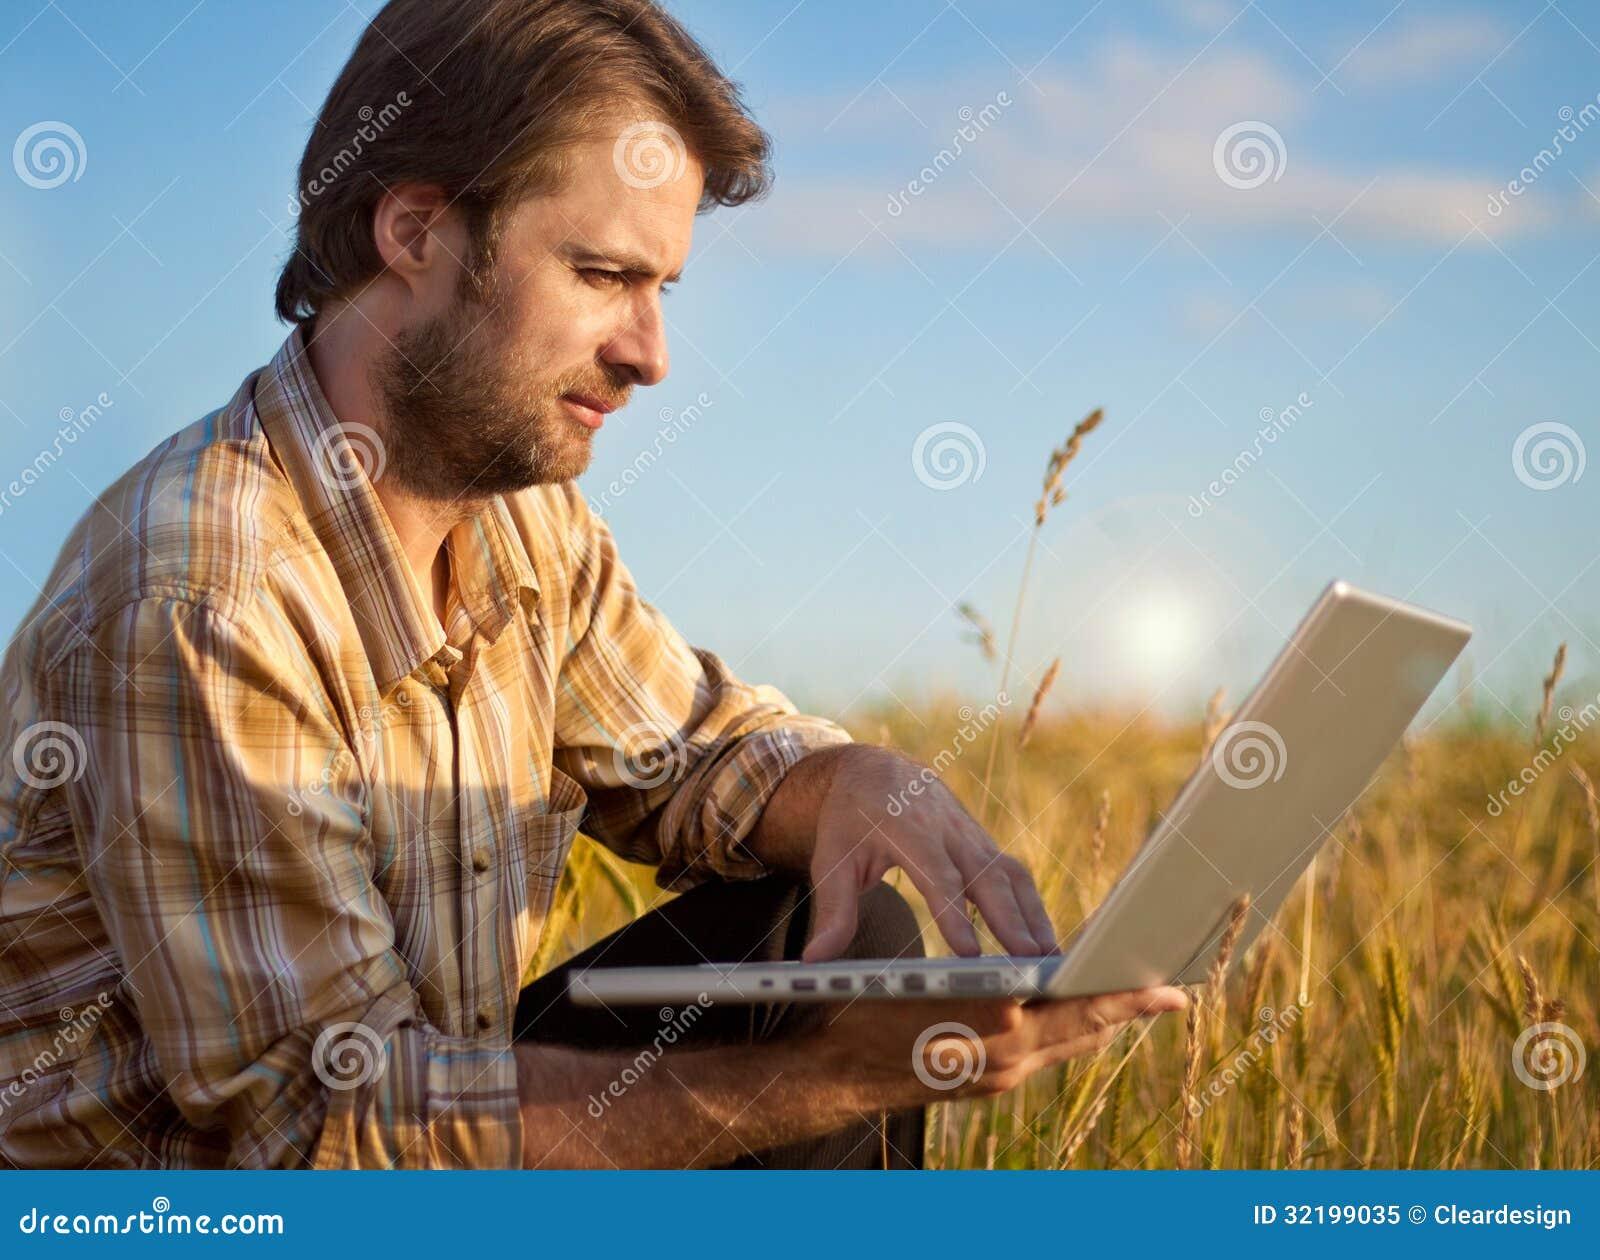 Modern Farmer On Wheat Field With Laptop Royalty Free